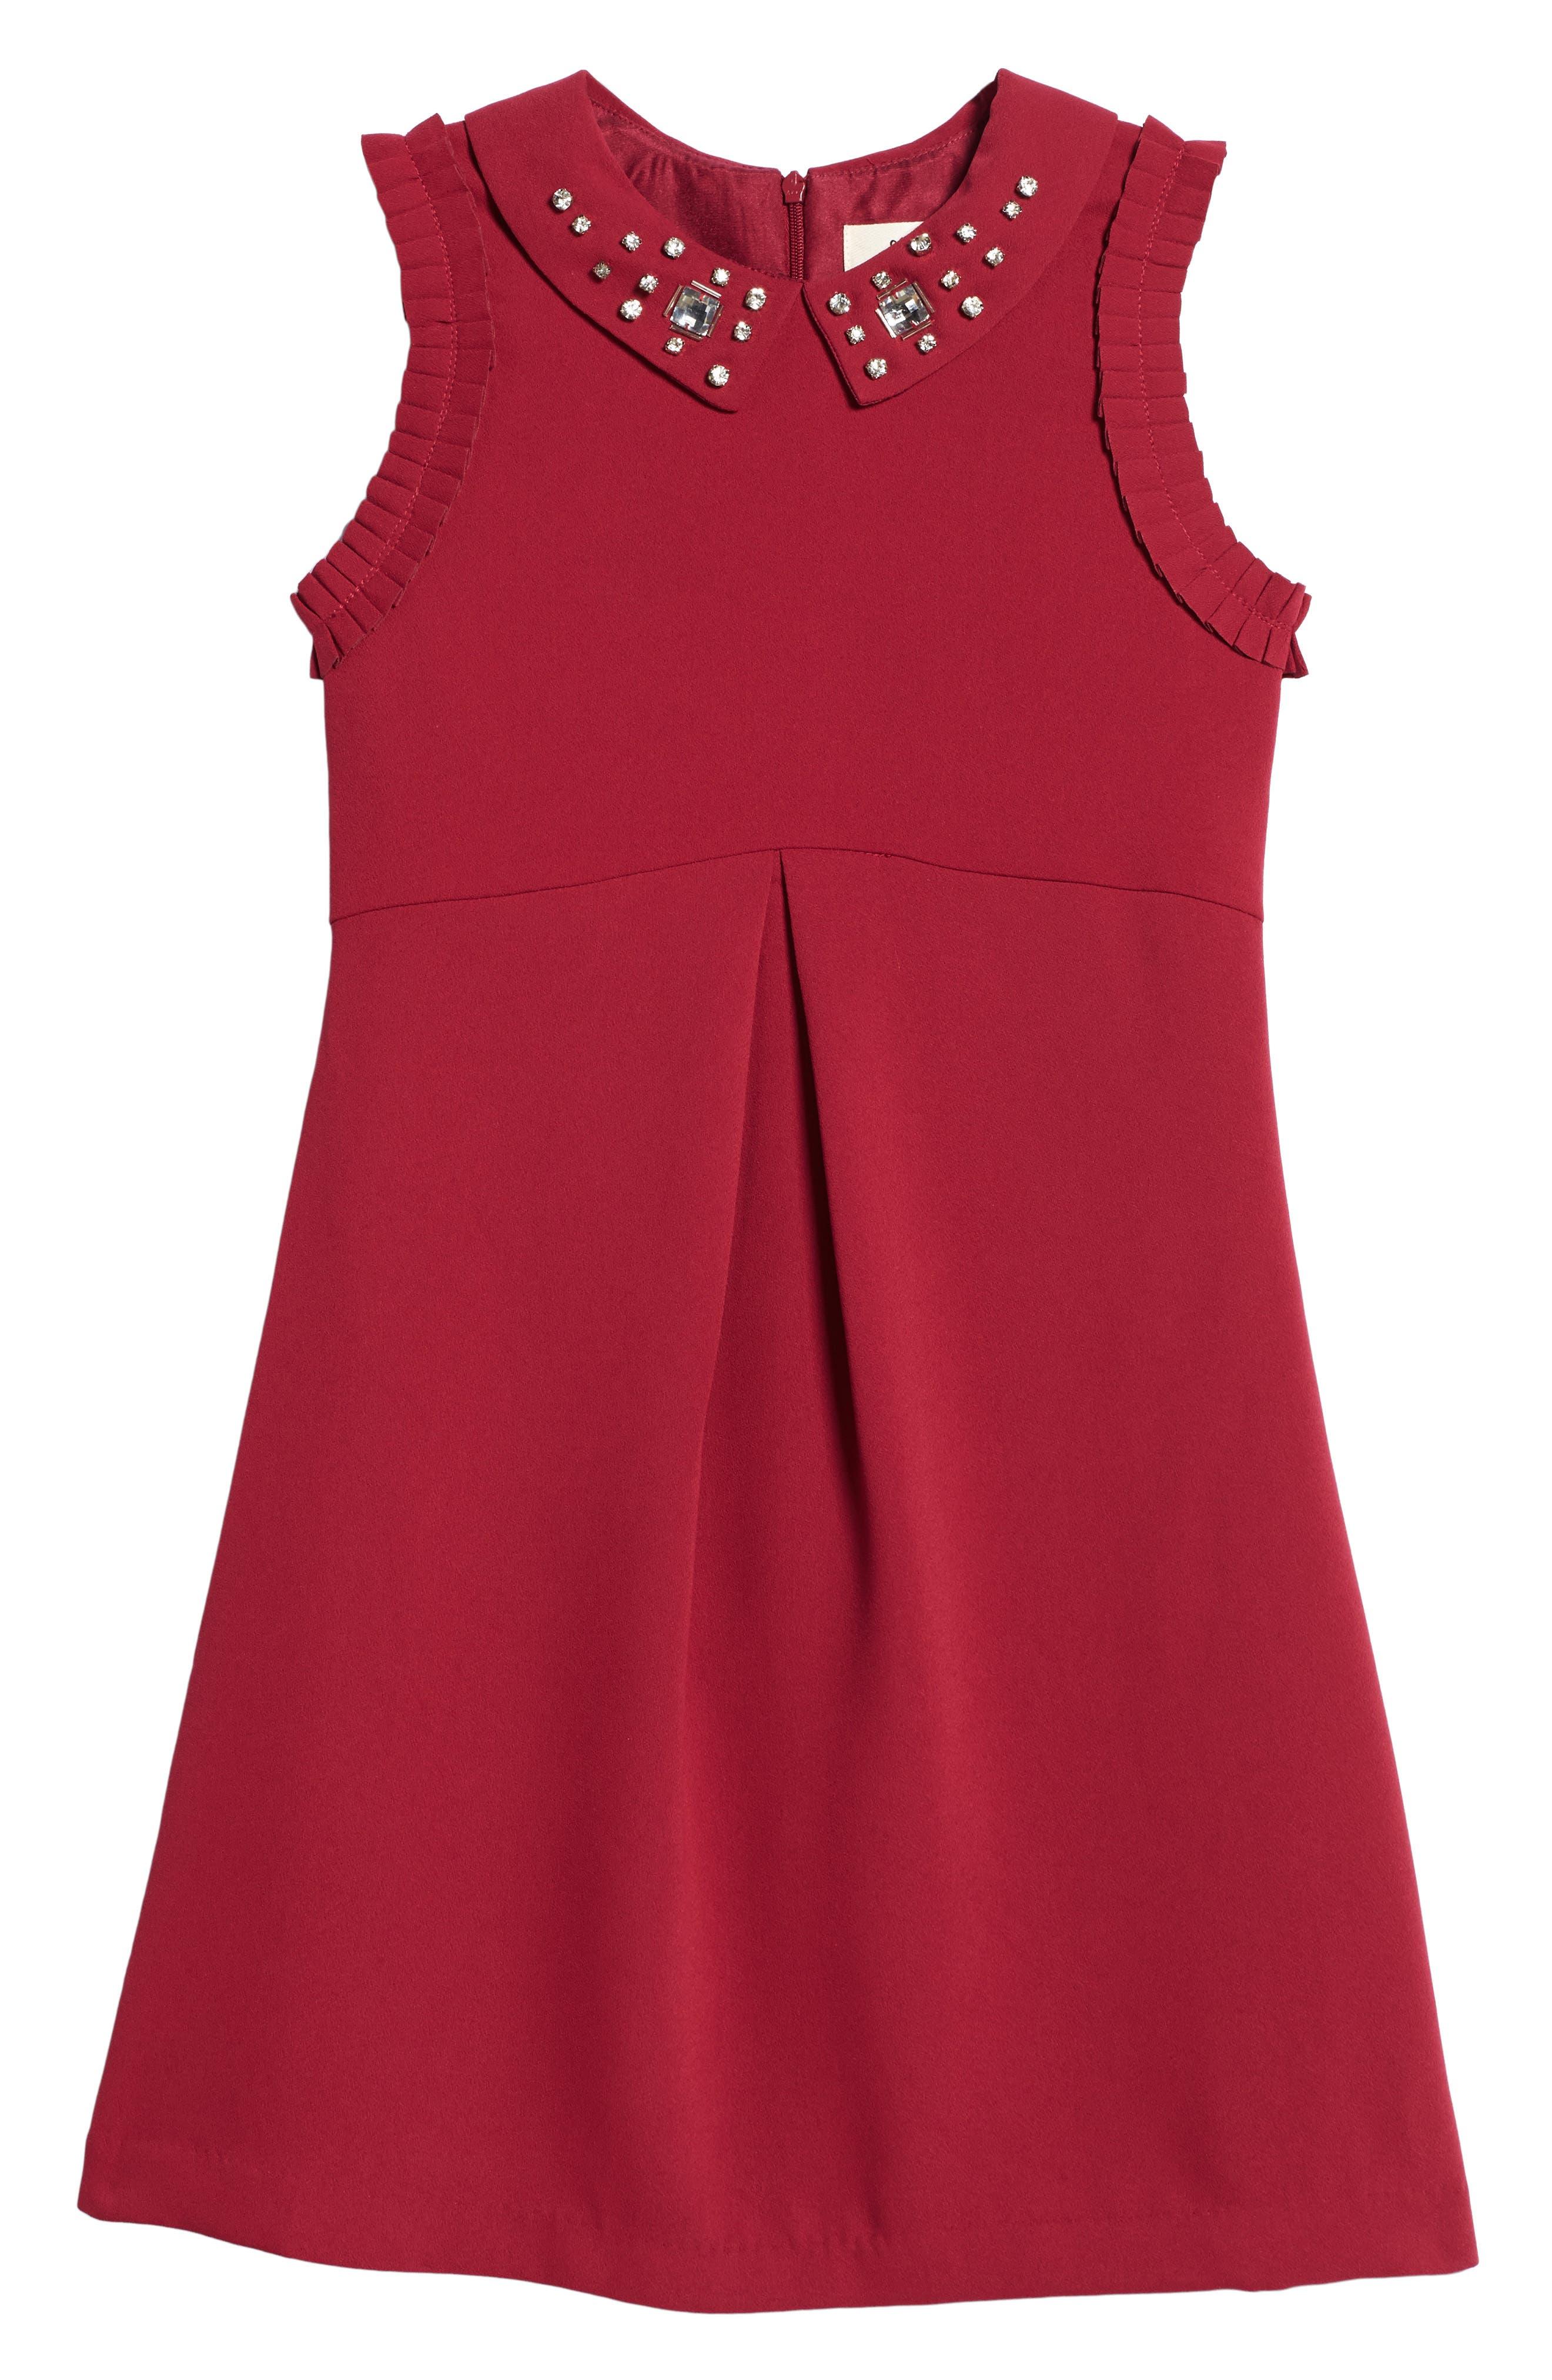 Main Image - Maddie Point Collar Dress (Big Girls)